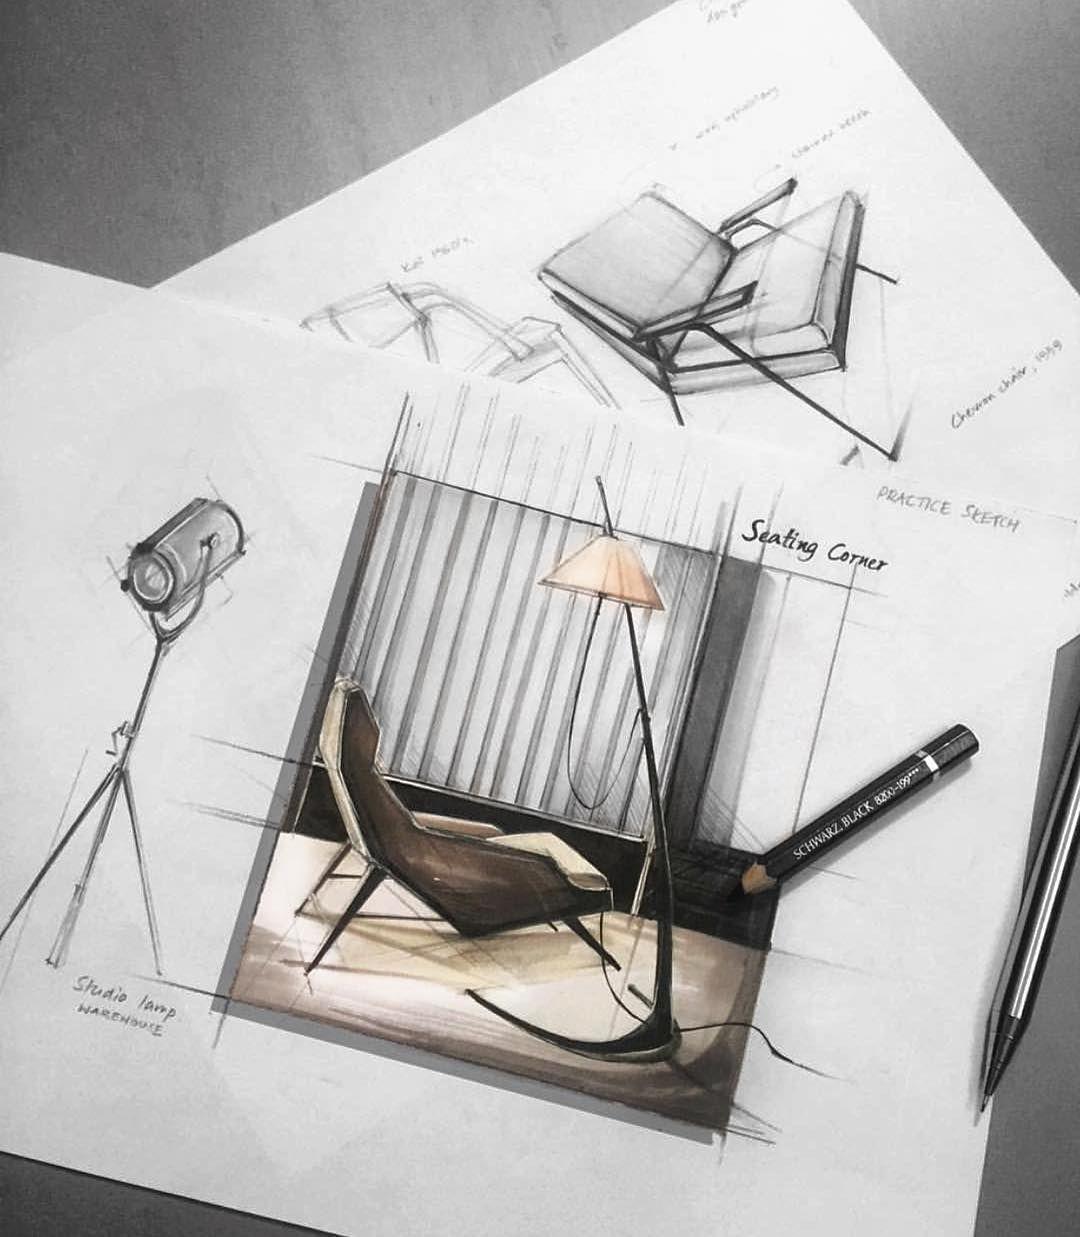 Смотрите это фото от Modernarchitect на Instagram  Отметки - Modern building sketches